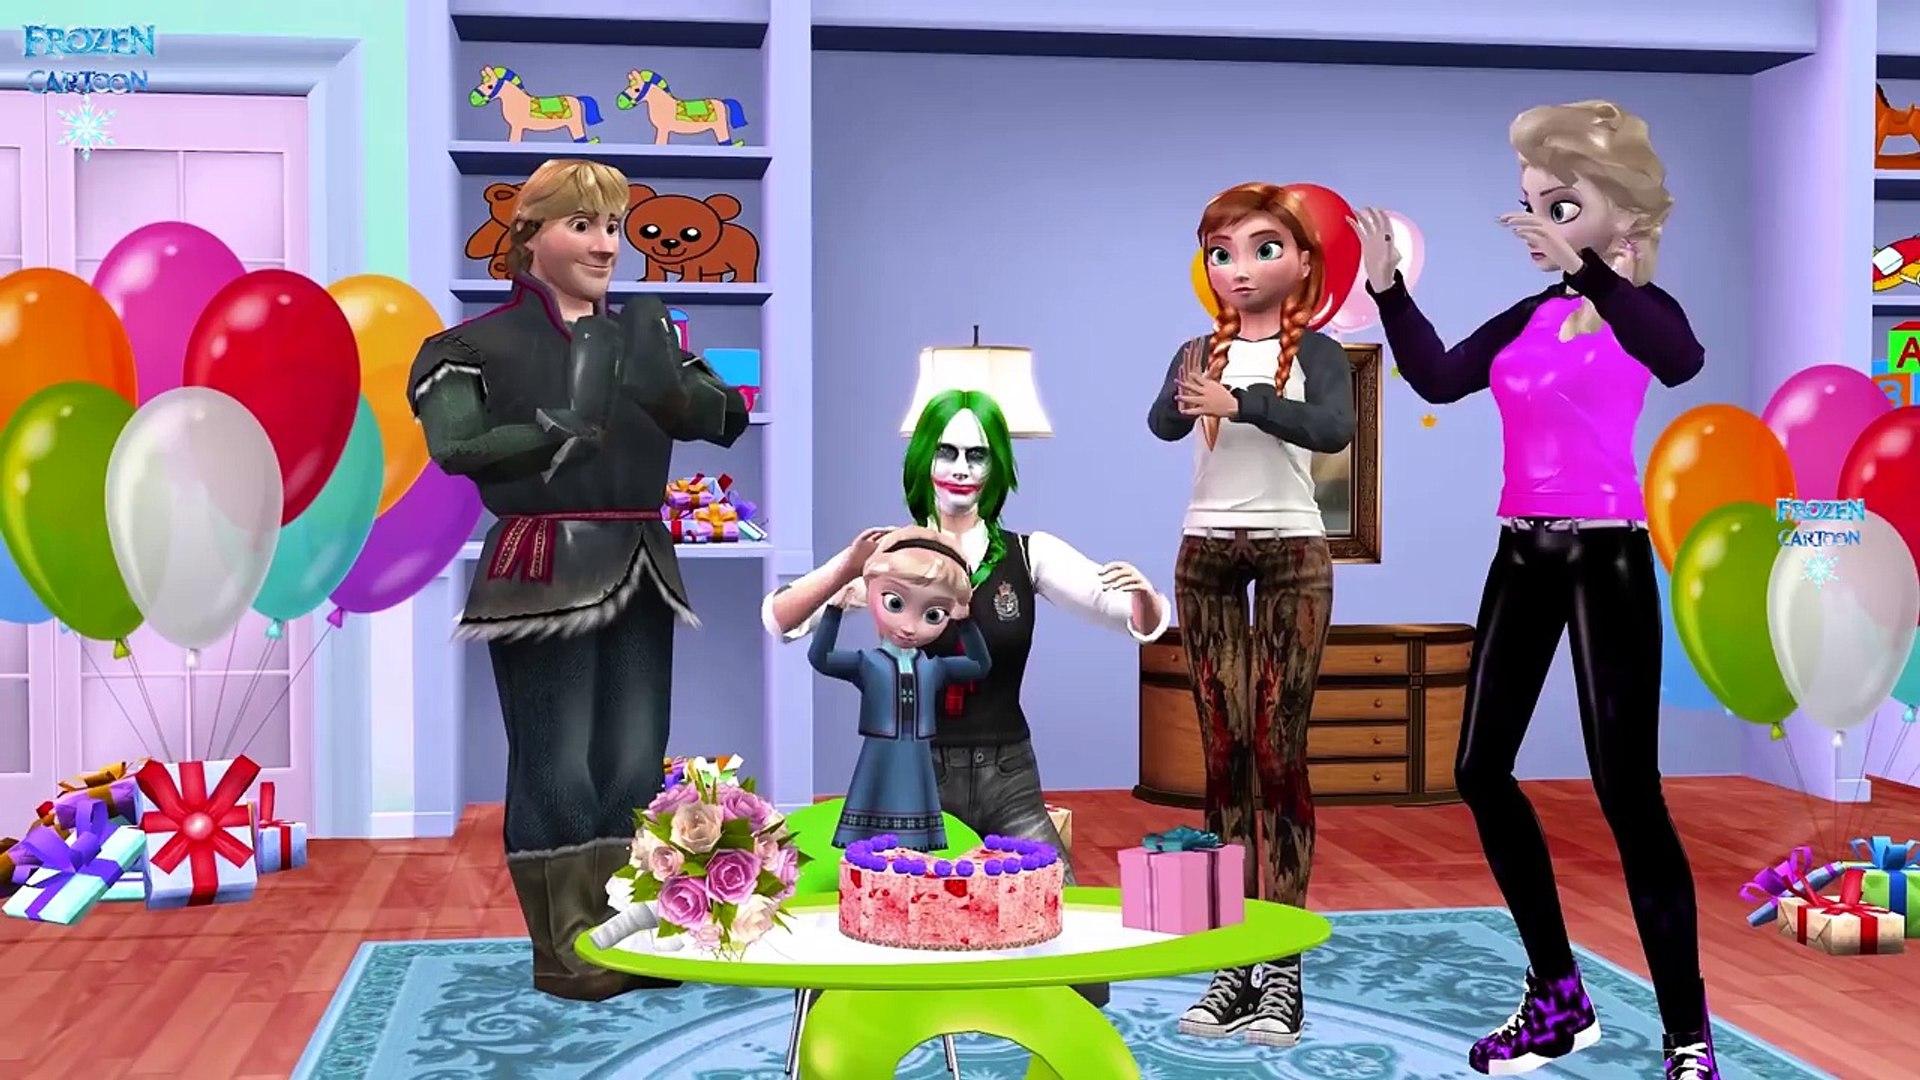 Joker Girl Frozen Little Elsa Happy Birthday Song | Surprise Eggs Opening Spiderman Ironman Toys